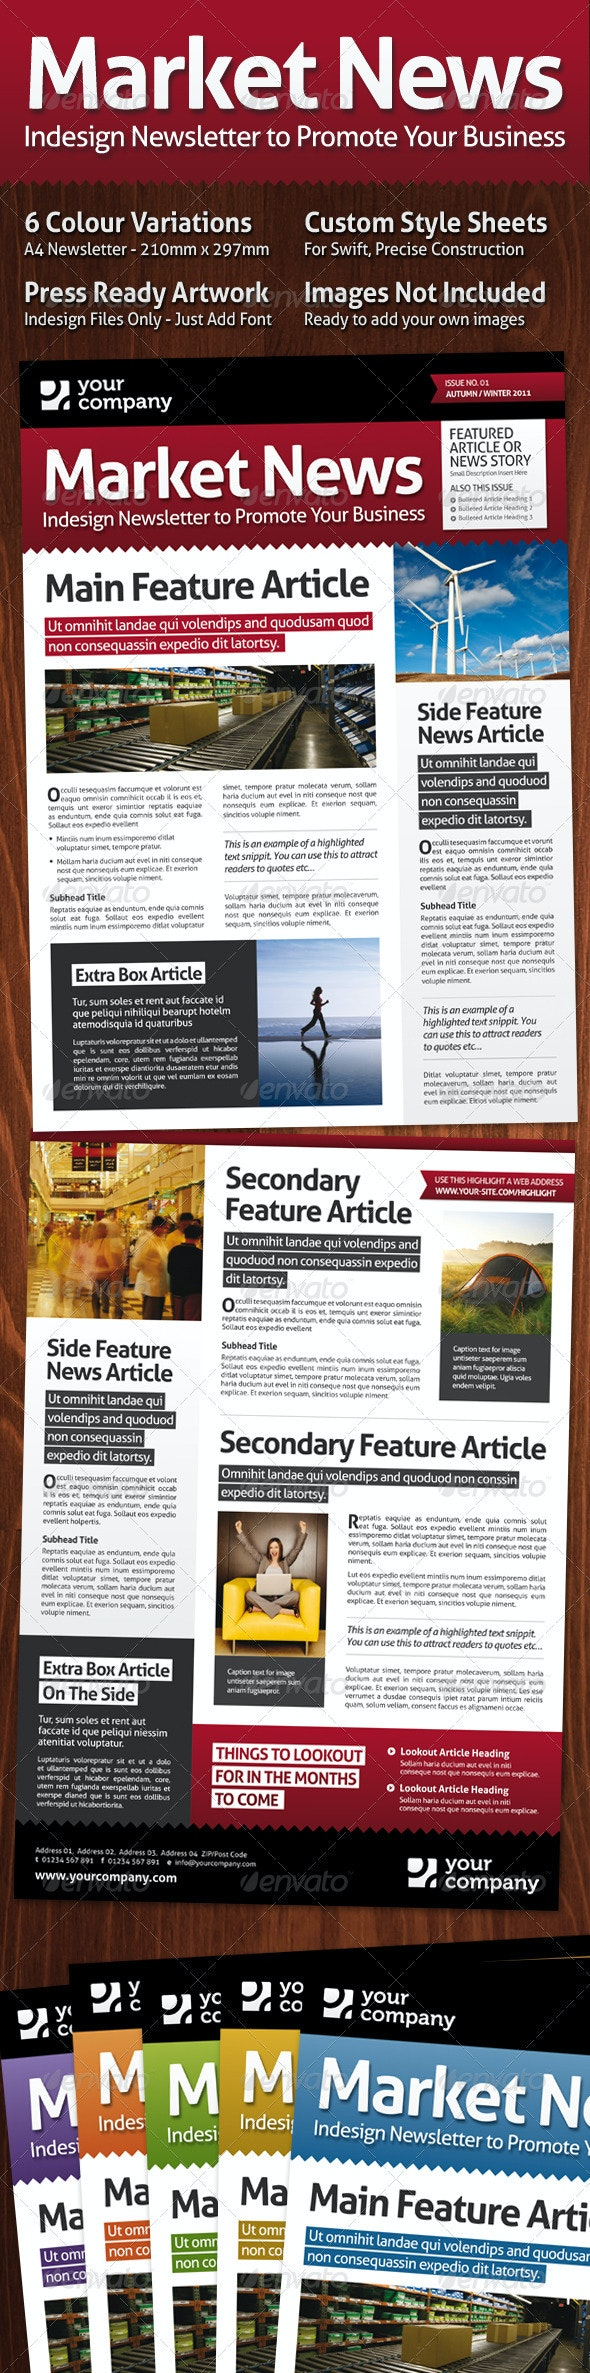 Market News, A4 Magazine Style Newsletter - Newsletters Print Templates